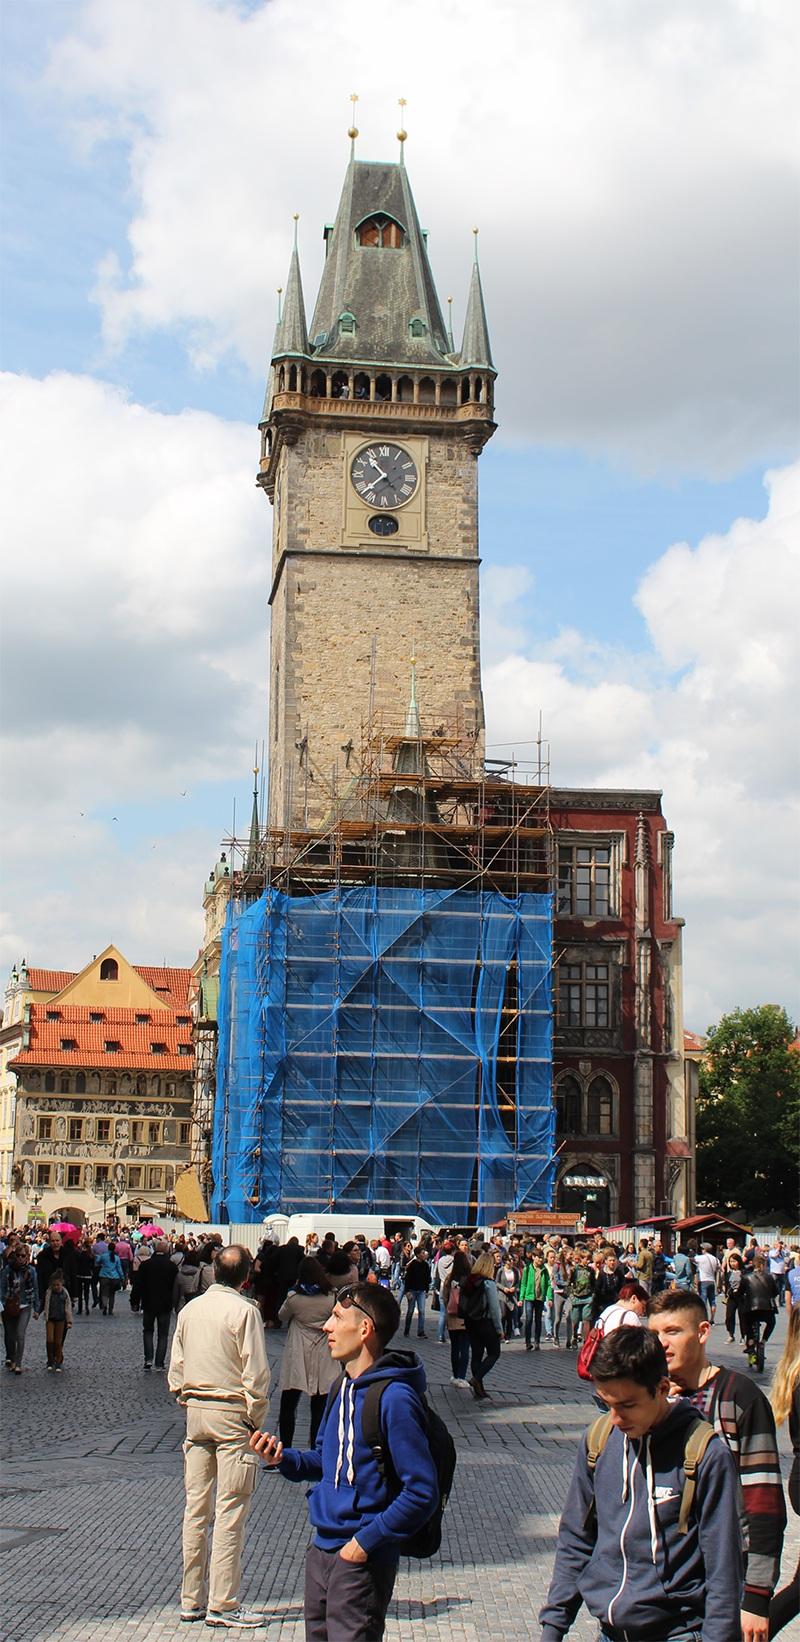 Rathaus - Altstädterring Prag